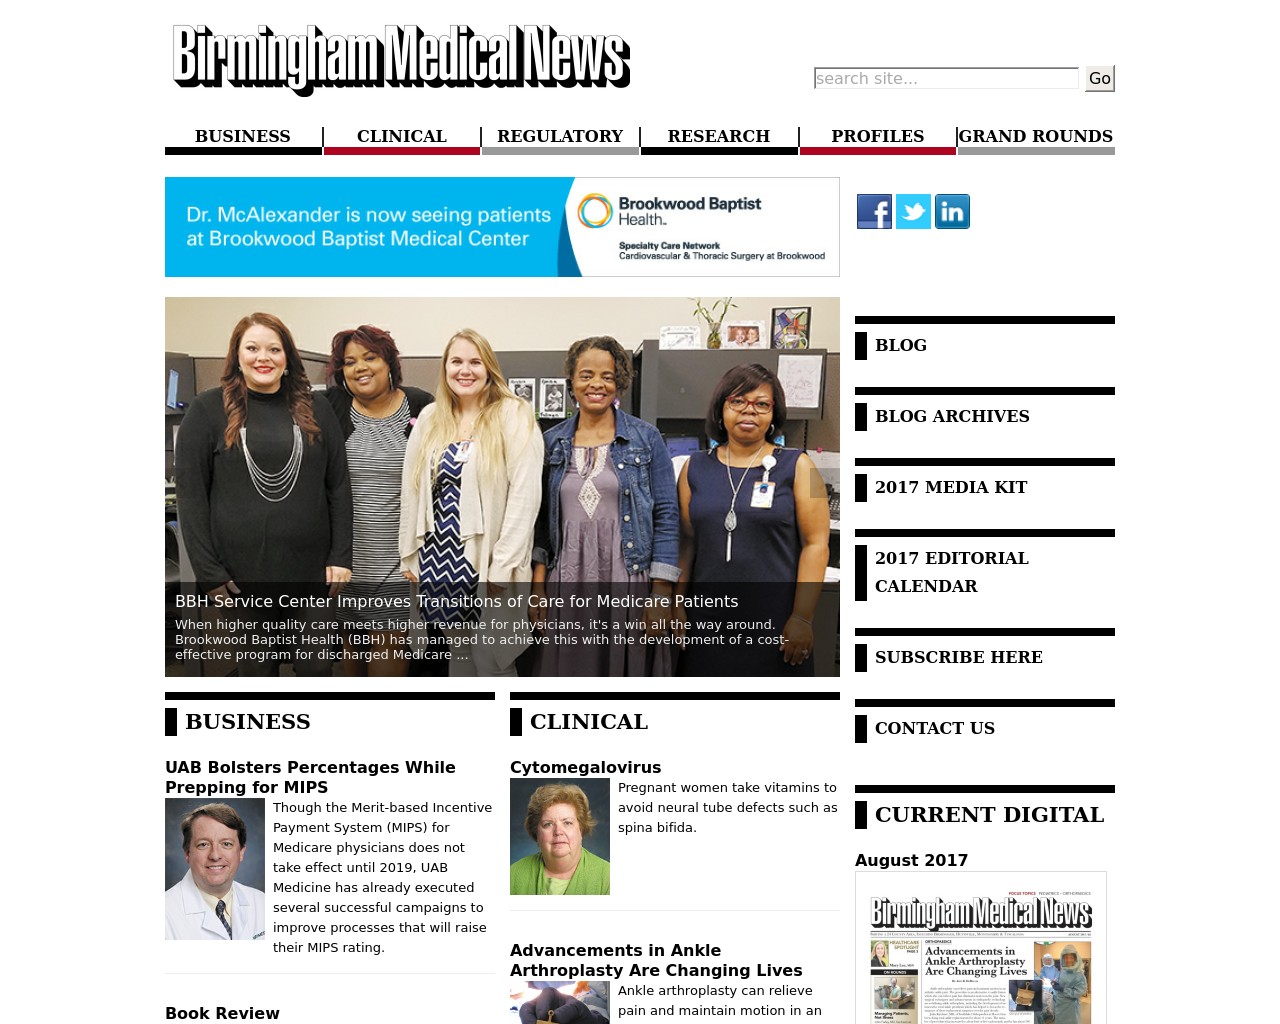 Birmingham-Medical-News-Advertising-Reviews-Pricing